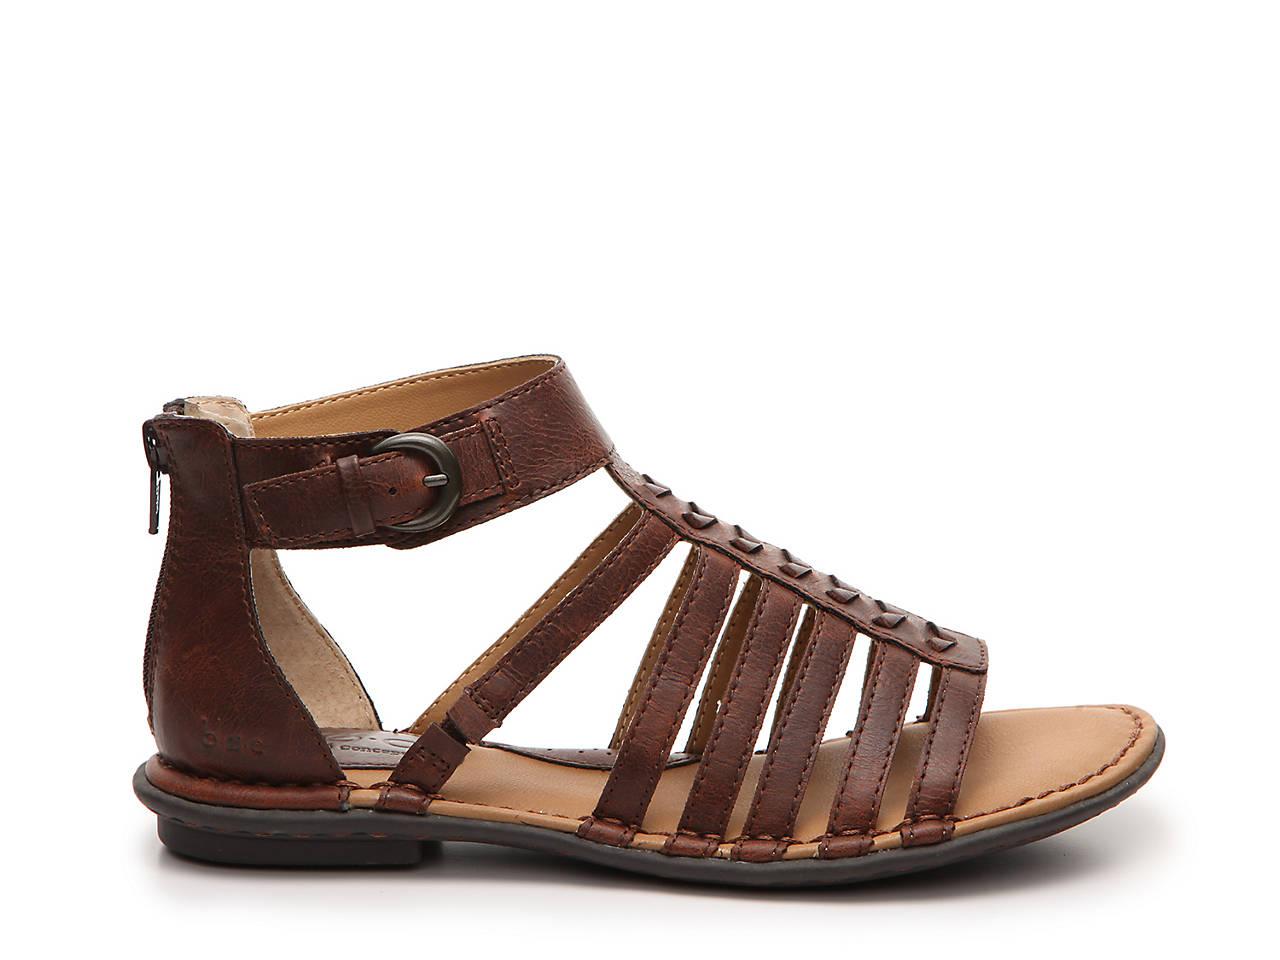 a476a5de6be b.o.c Carrick Gladiator Sandal Women s Shoes